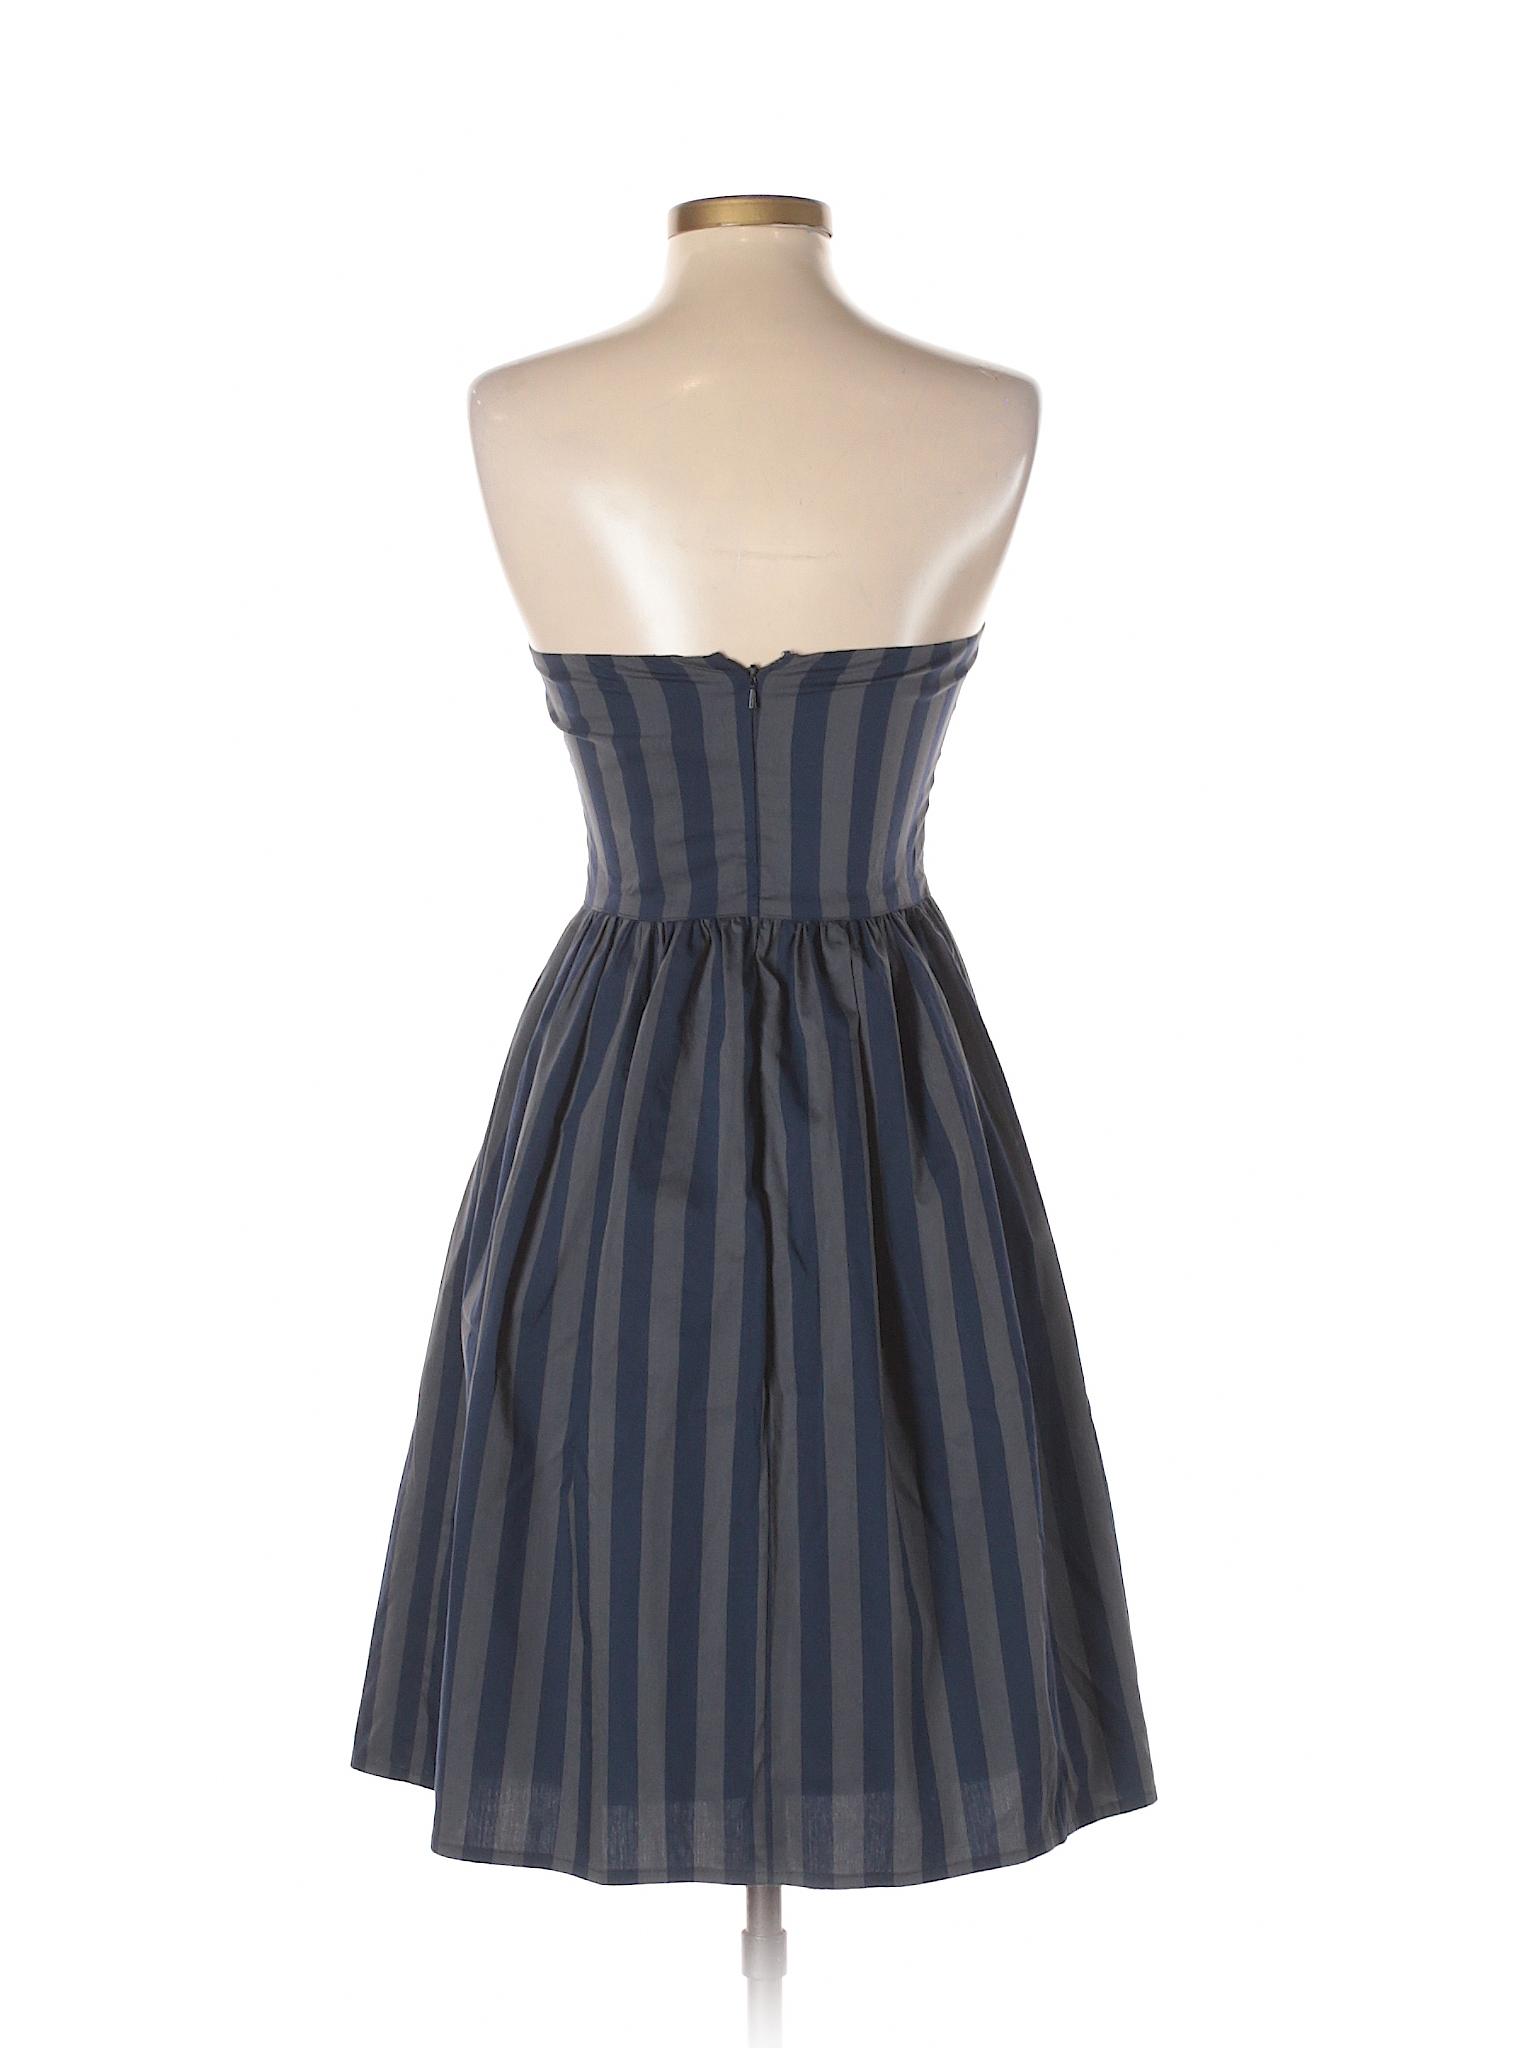 Dress Selling Selling Dress Casual Dress Sherman Ben Selling Sherman Sherman Selling Casual Ben Ben Casual pcgq1gnX